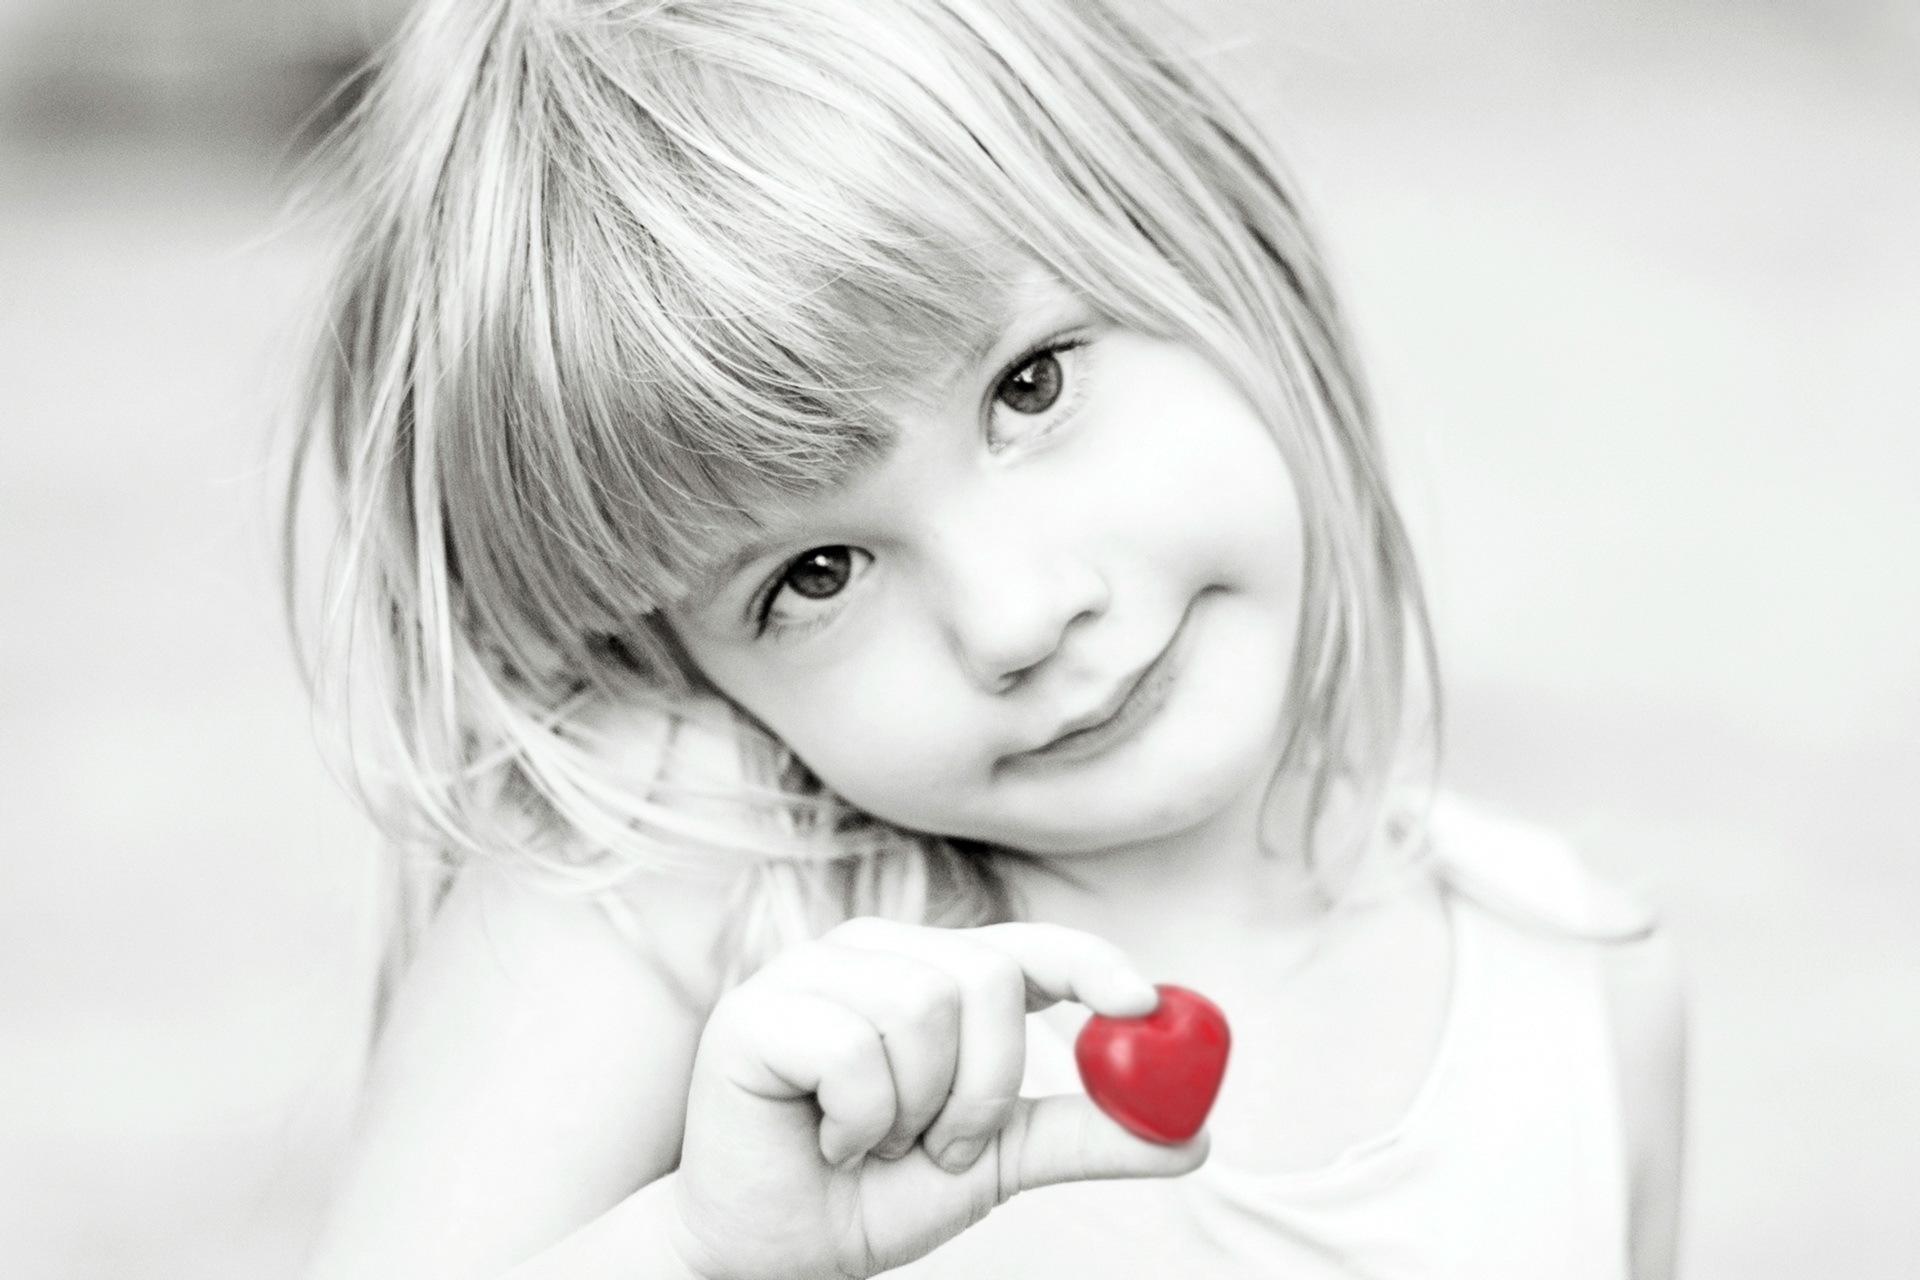 Картинка девочки с сердцем